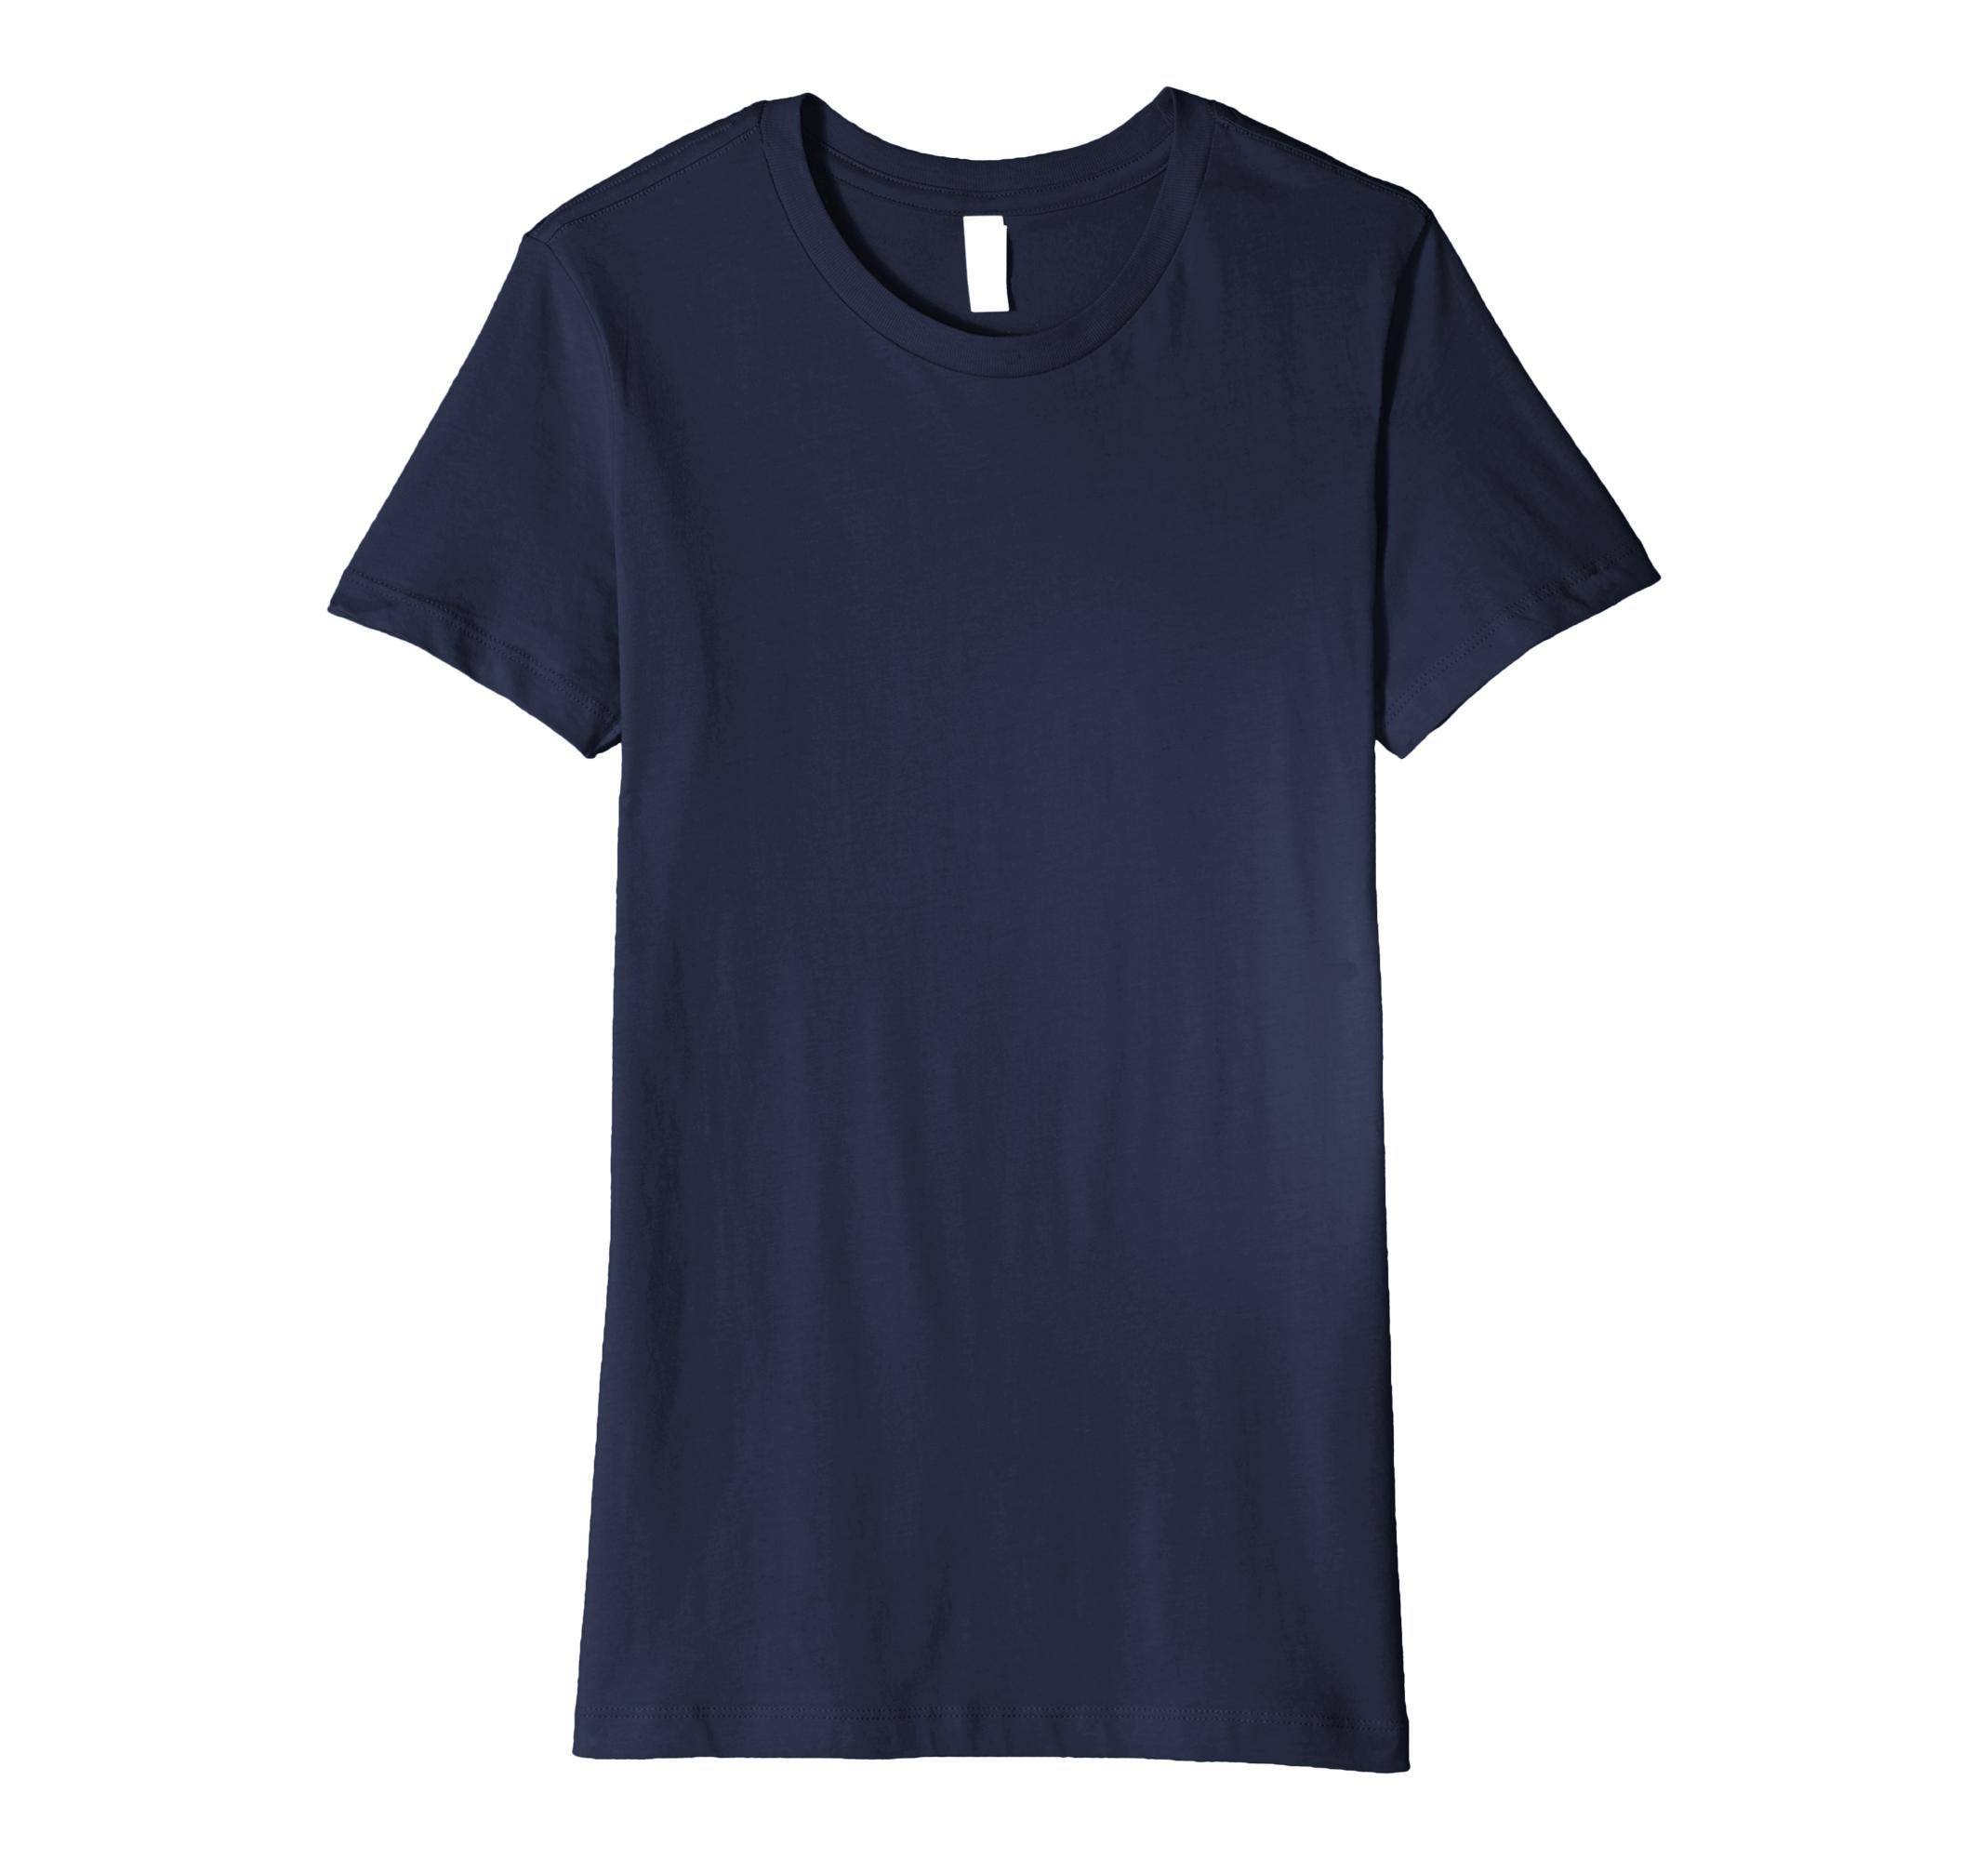 Men T Shirt Haiti My Country My Home National Flag Cotton Funny T-shirt Novelty Tshirt Women Durable Service Tops & Tees